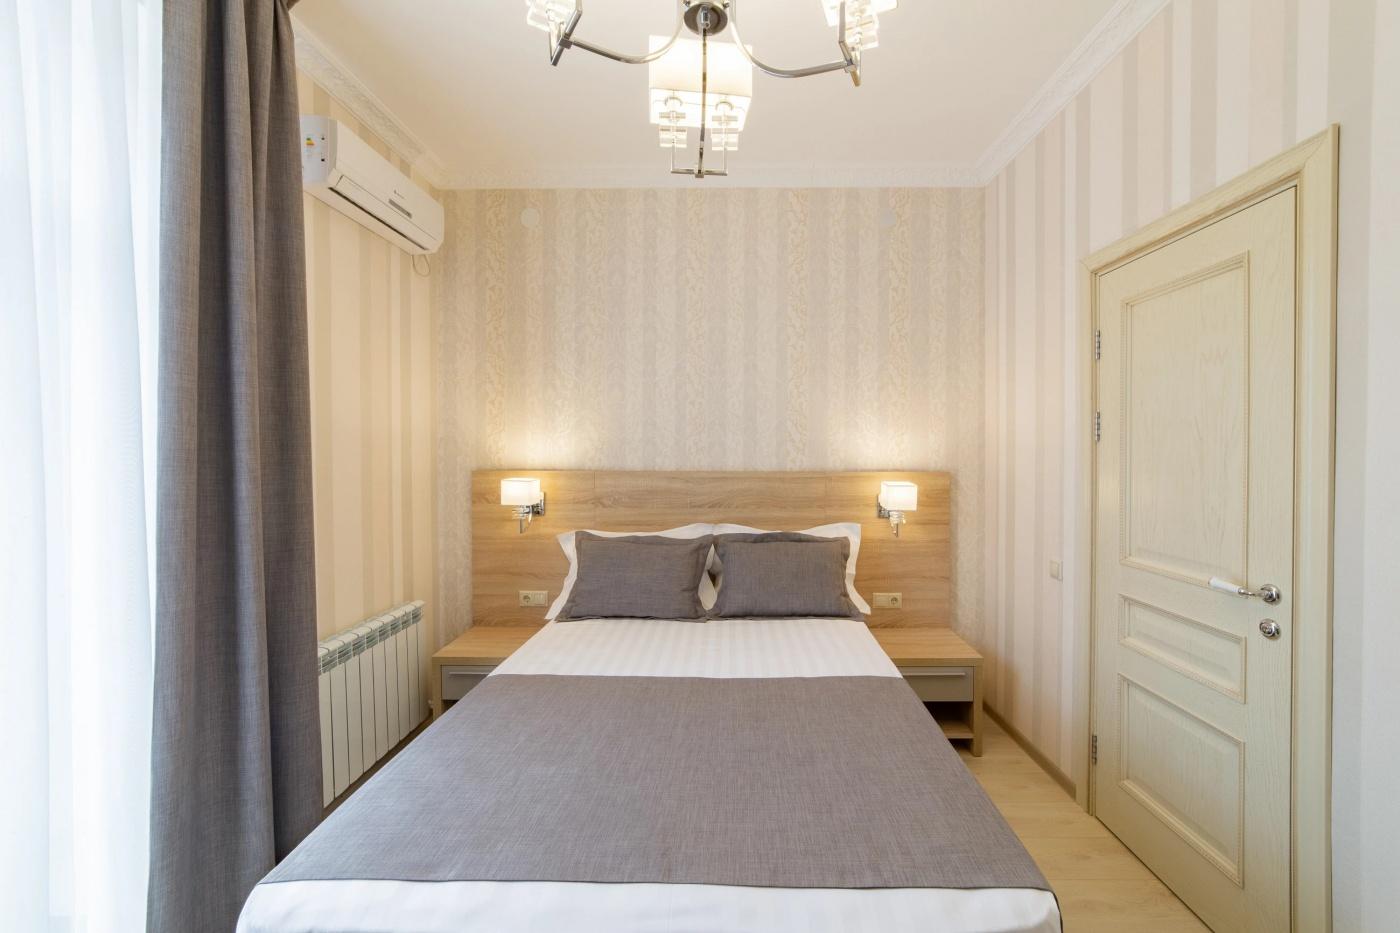 Отель «Alean Family Hotel Usadba 4*» Краснодарский край Стандарт 1-местный, фото 1